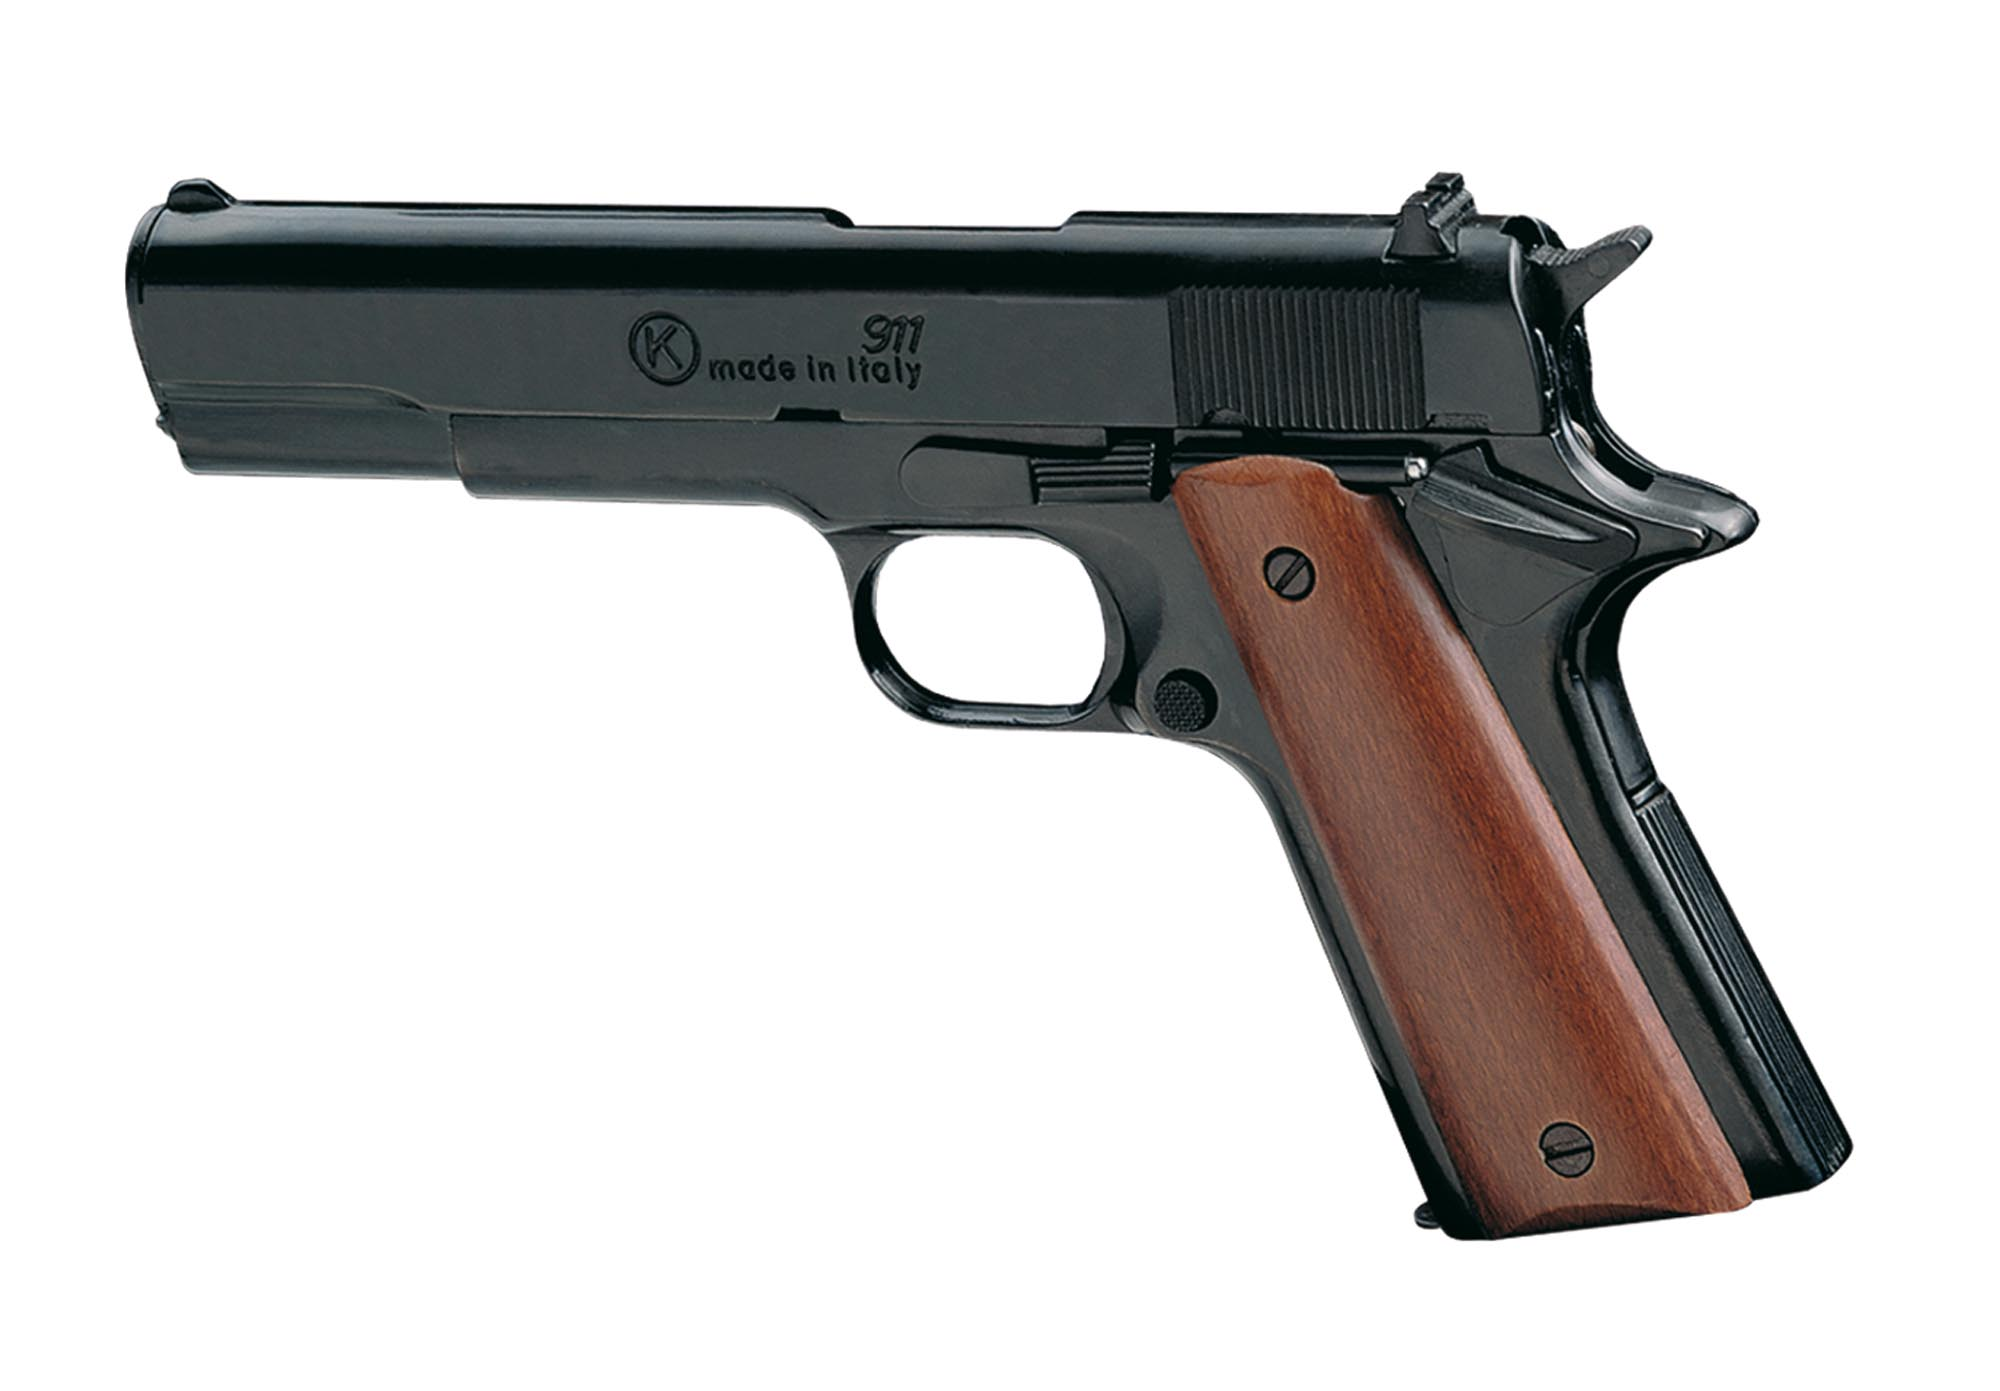 eaab220 chiappa pistolet 9 mm blanc 911 bronz chiappa. Black Bedroom Furniture Sets. Home Design Ideas